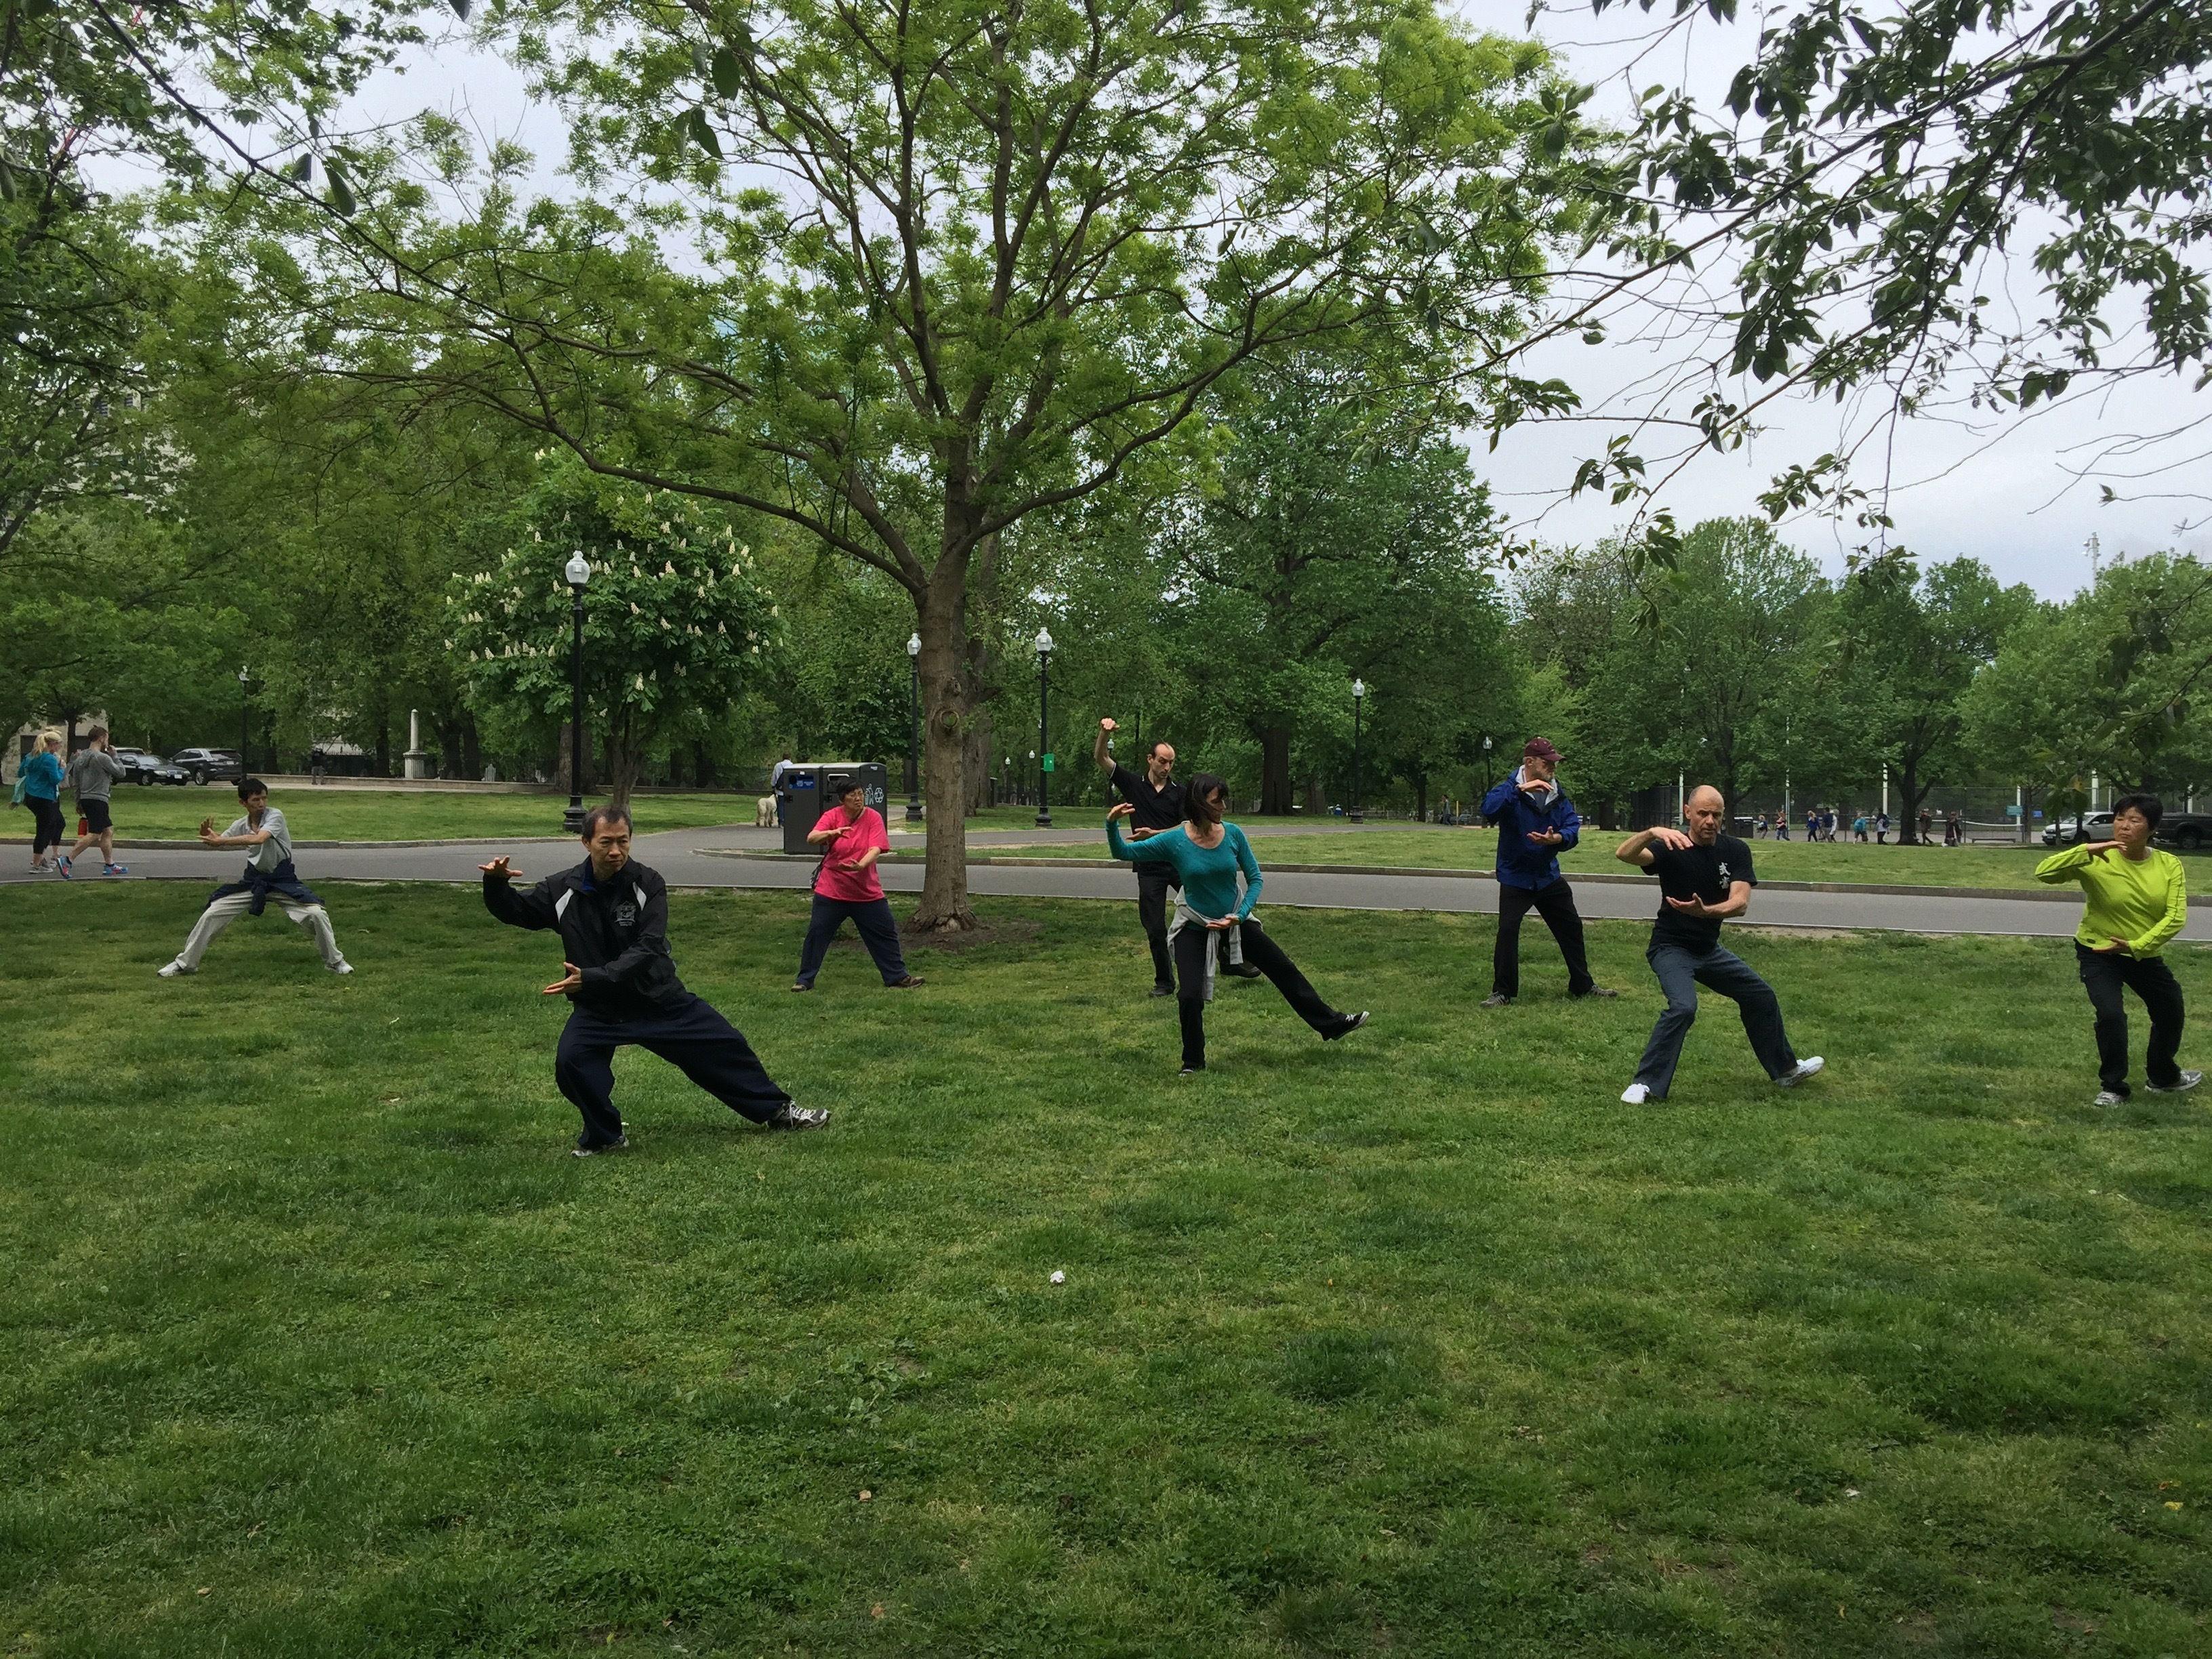 Daoist Benevolent Association's Weekly Free Tai Chi Class